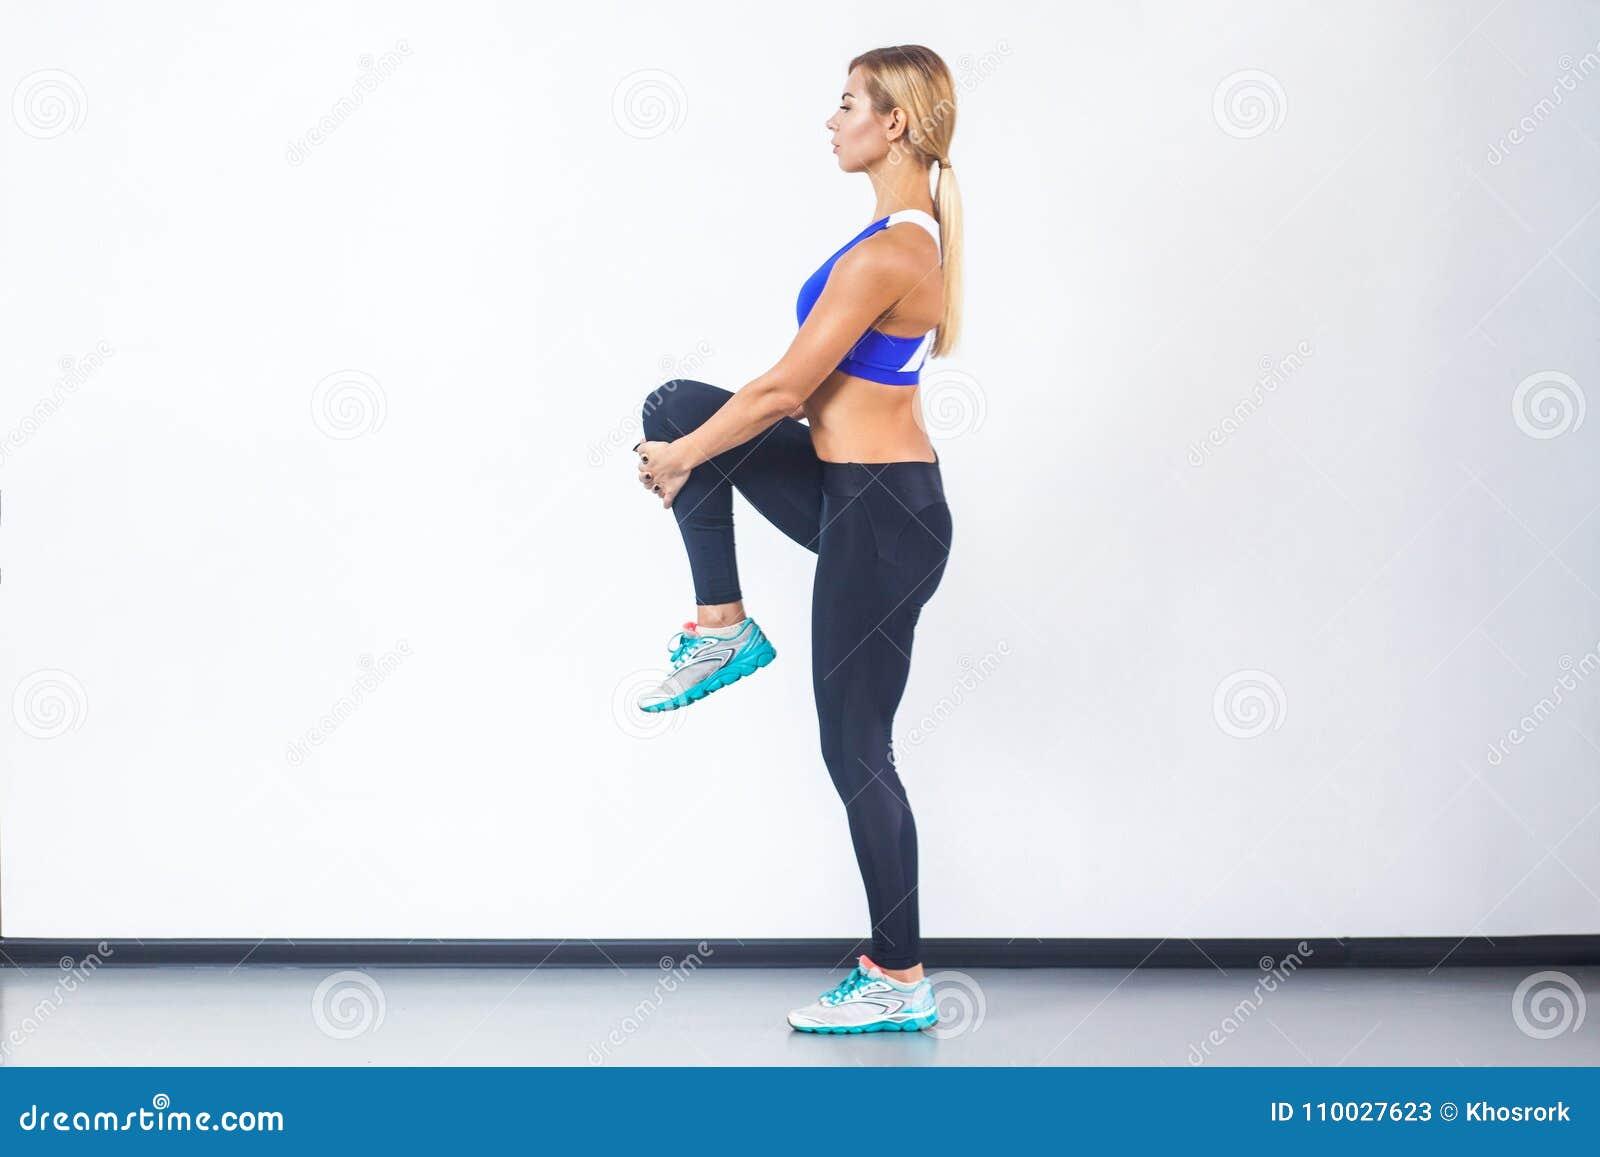 Rofile view blonde sporty woman, balancing on one leg